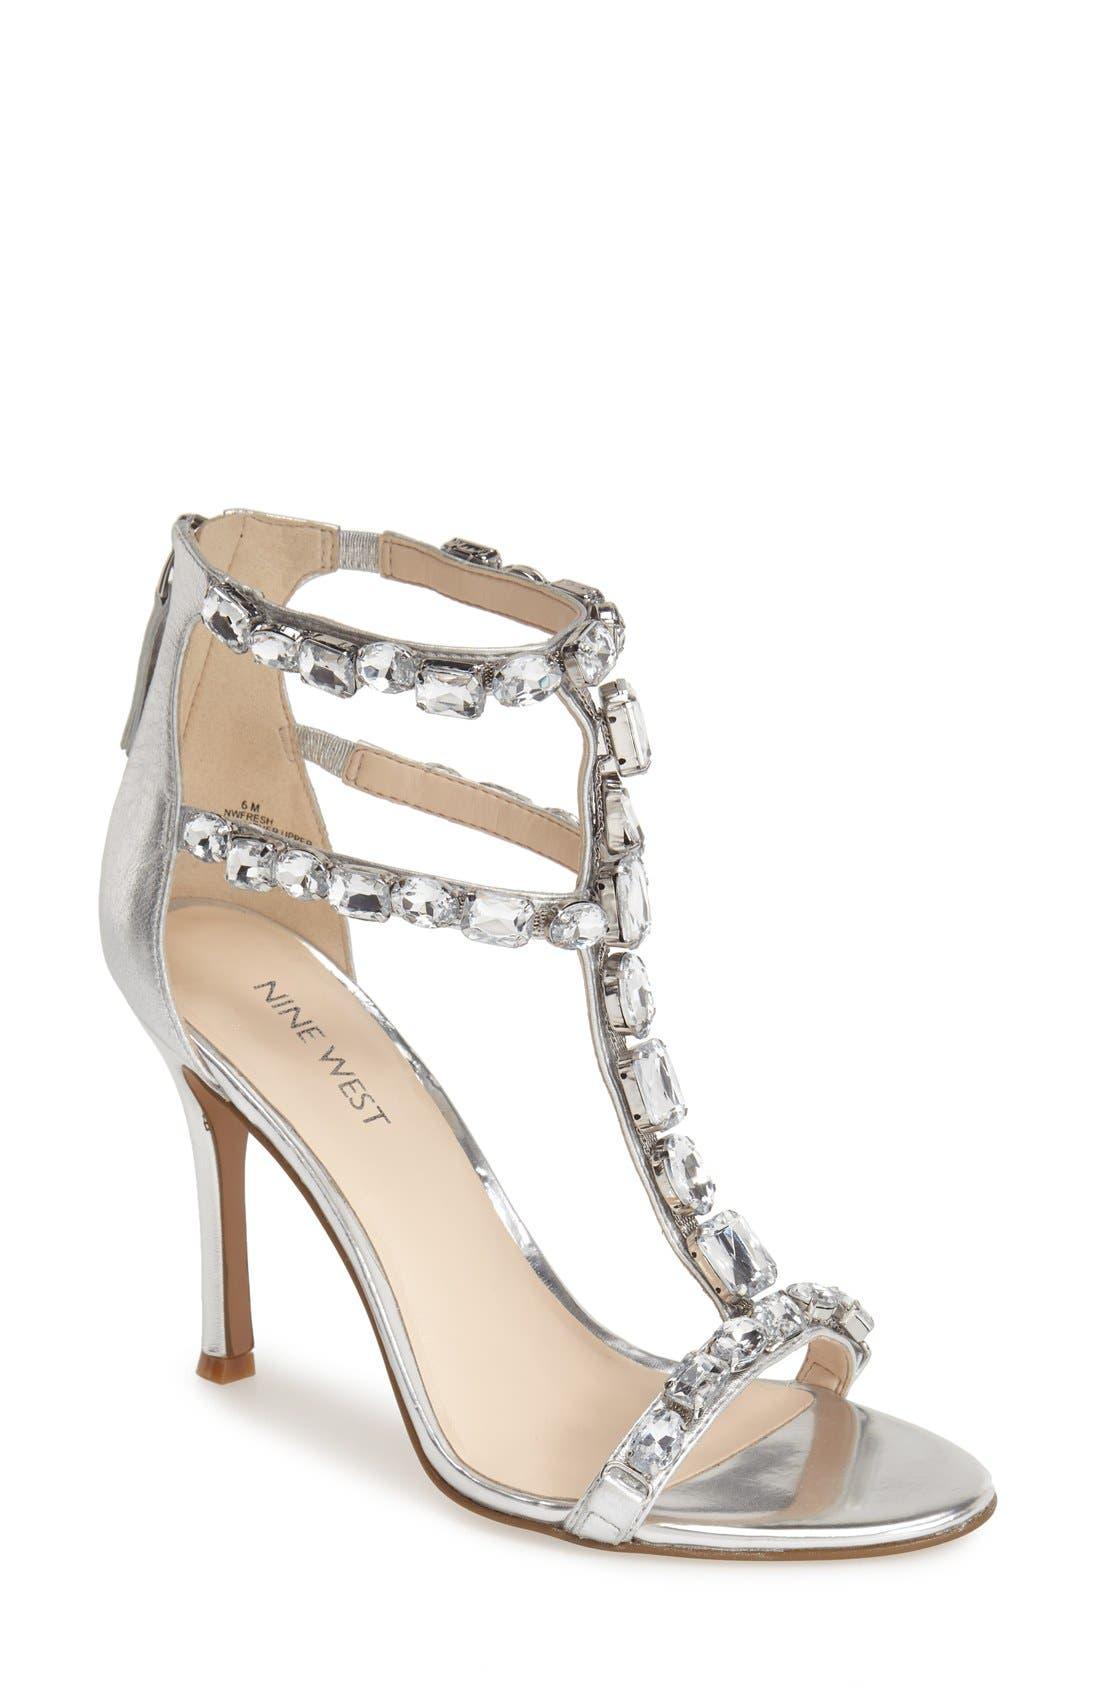 Main Image - Nine West 'Fresh' Crystal T-Strap Sandal (Women)